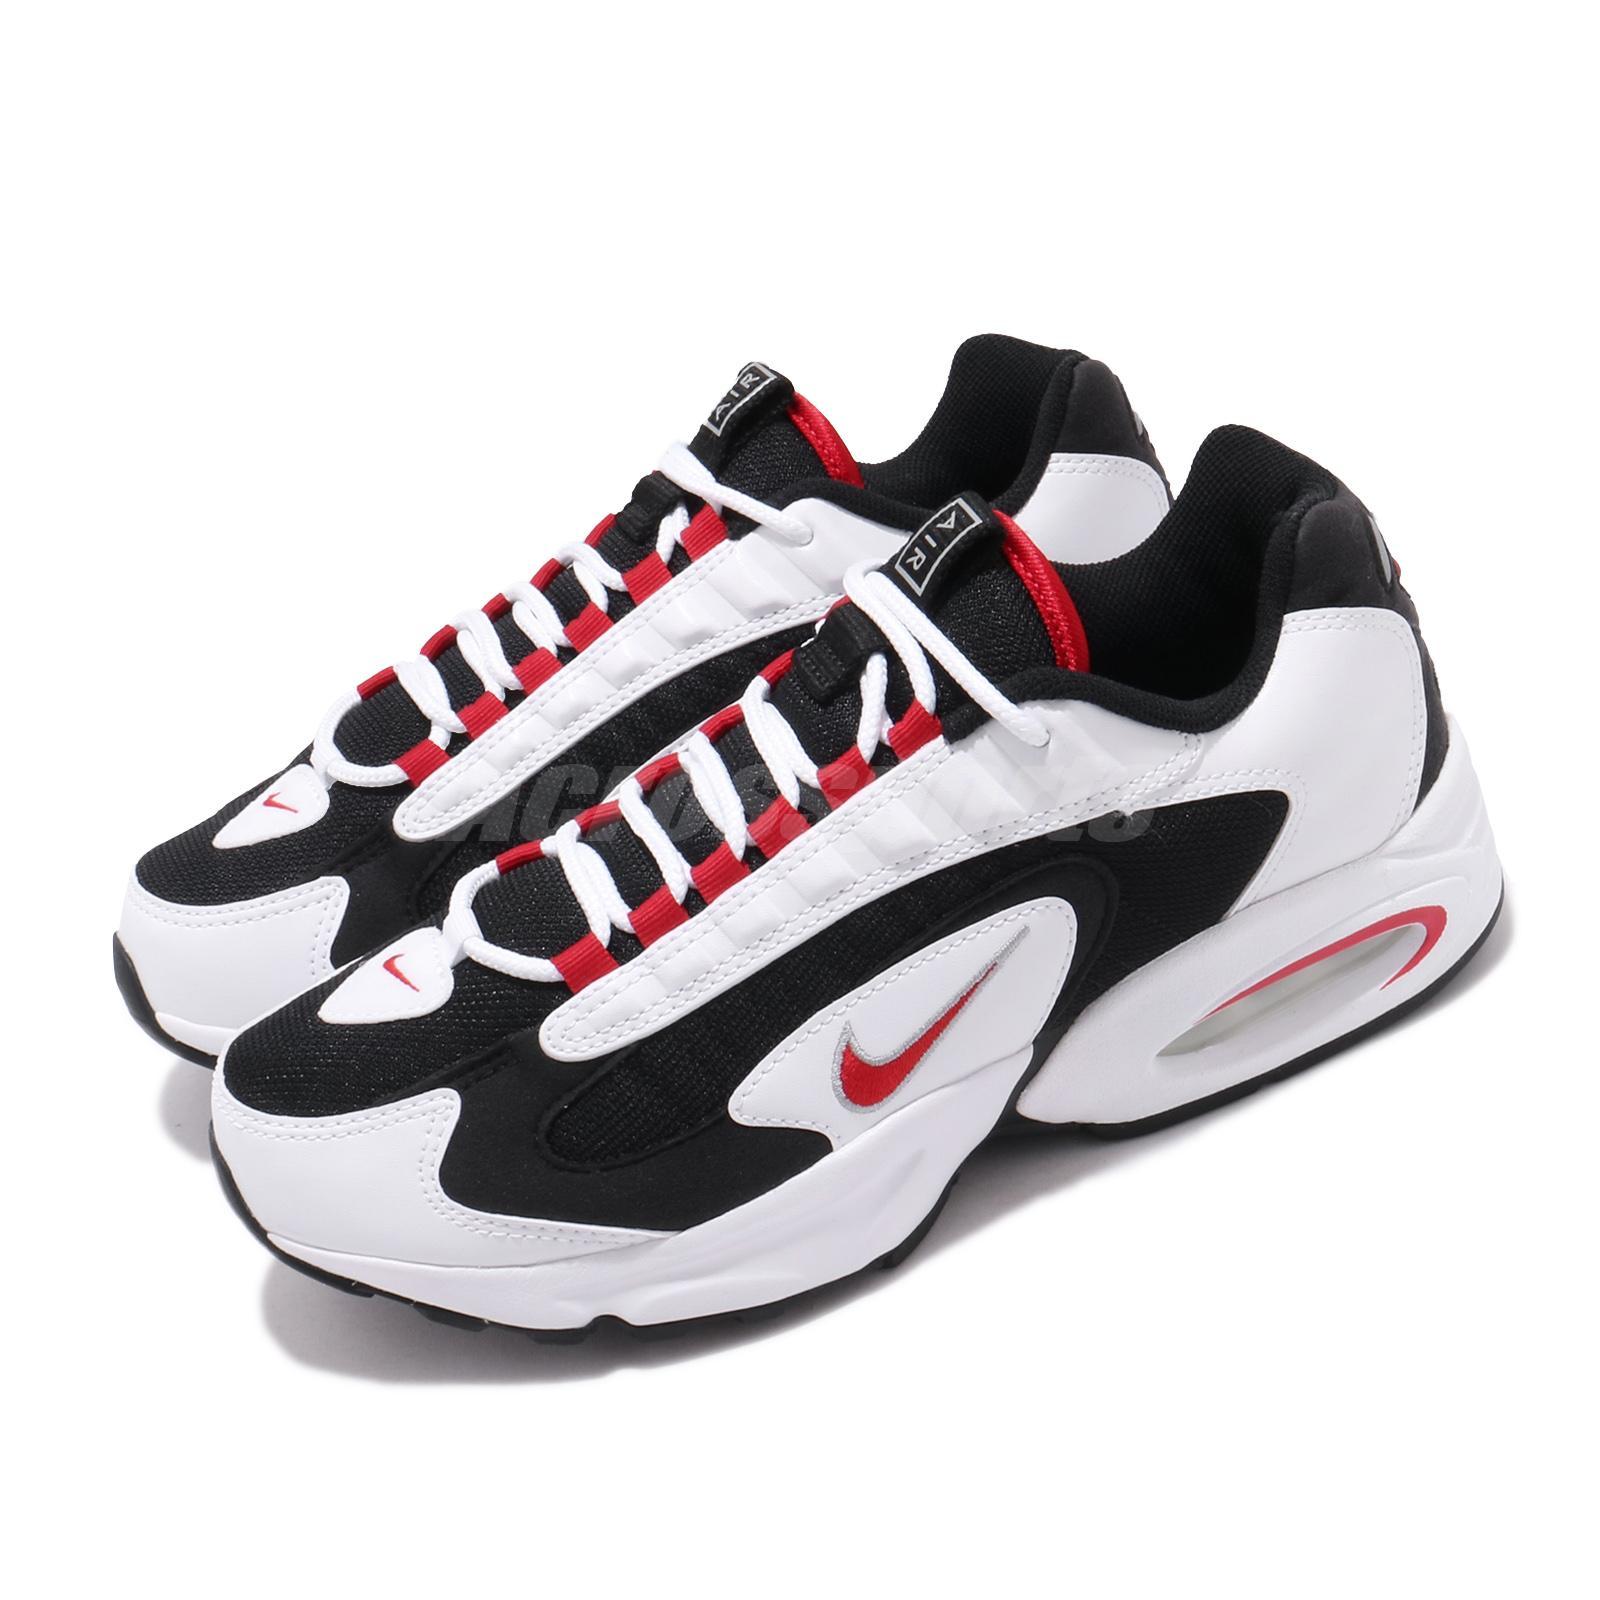 exterior Circular eternamente  Nike Air Max Triax 96 White Red Black Mens Retro Running Shoes CD2053-105 |  eBay